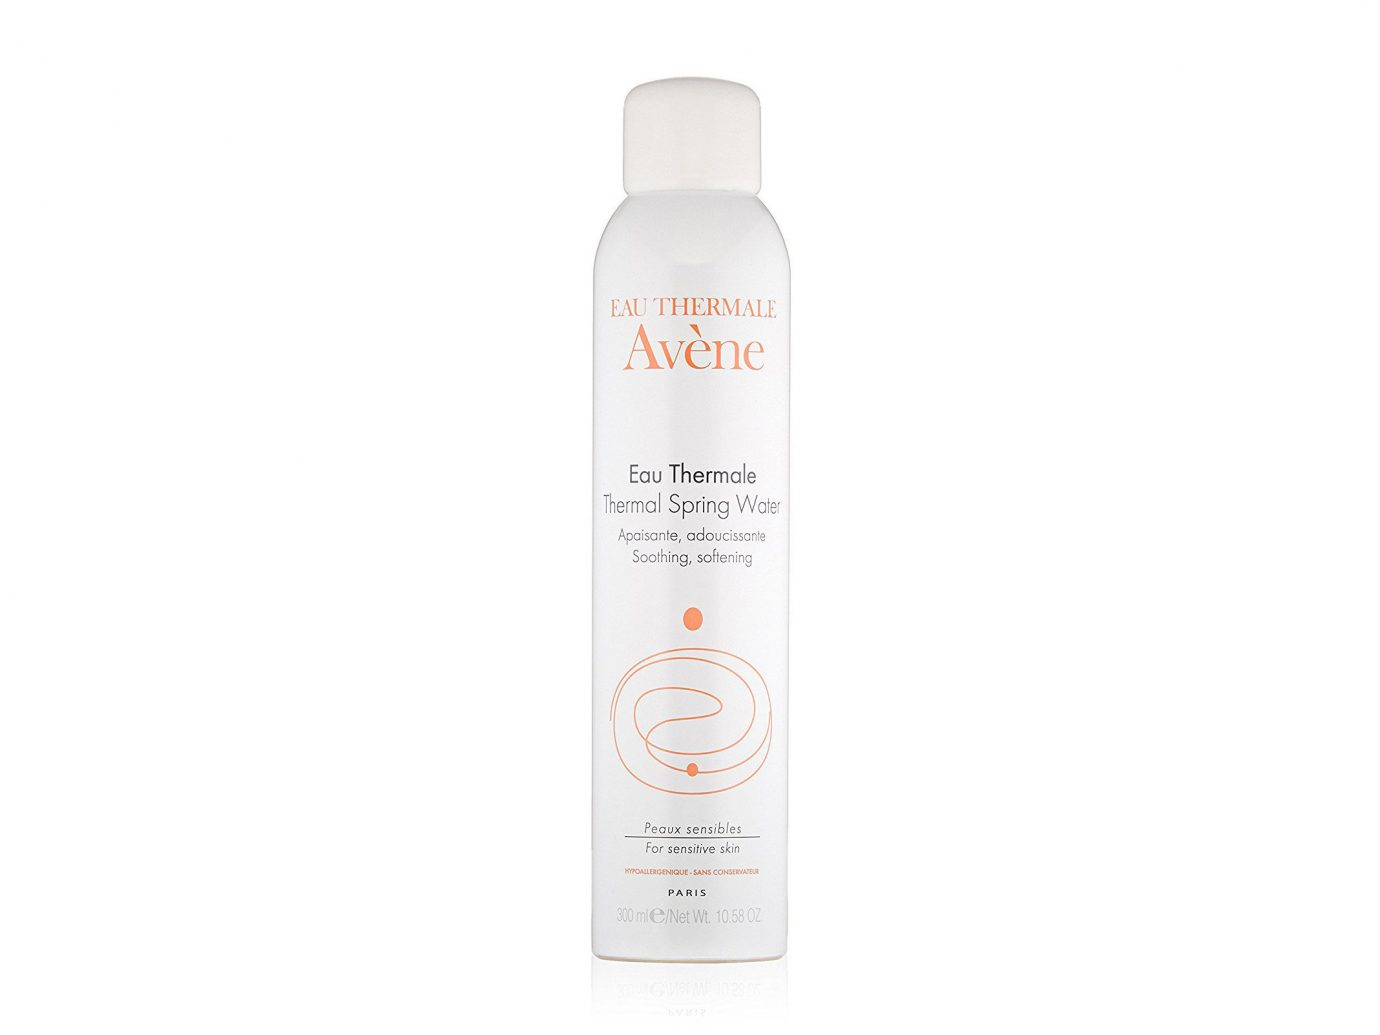 Beauty Health + Wellness Travel Shop product toiletry skin care lotion spray liquid health & beauty